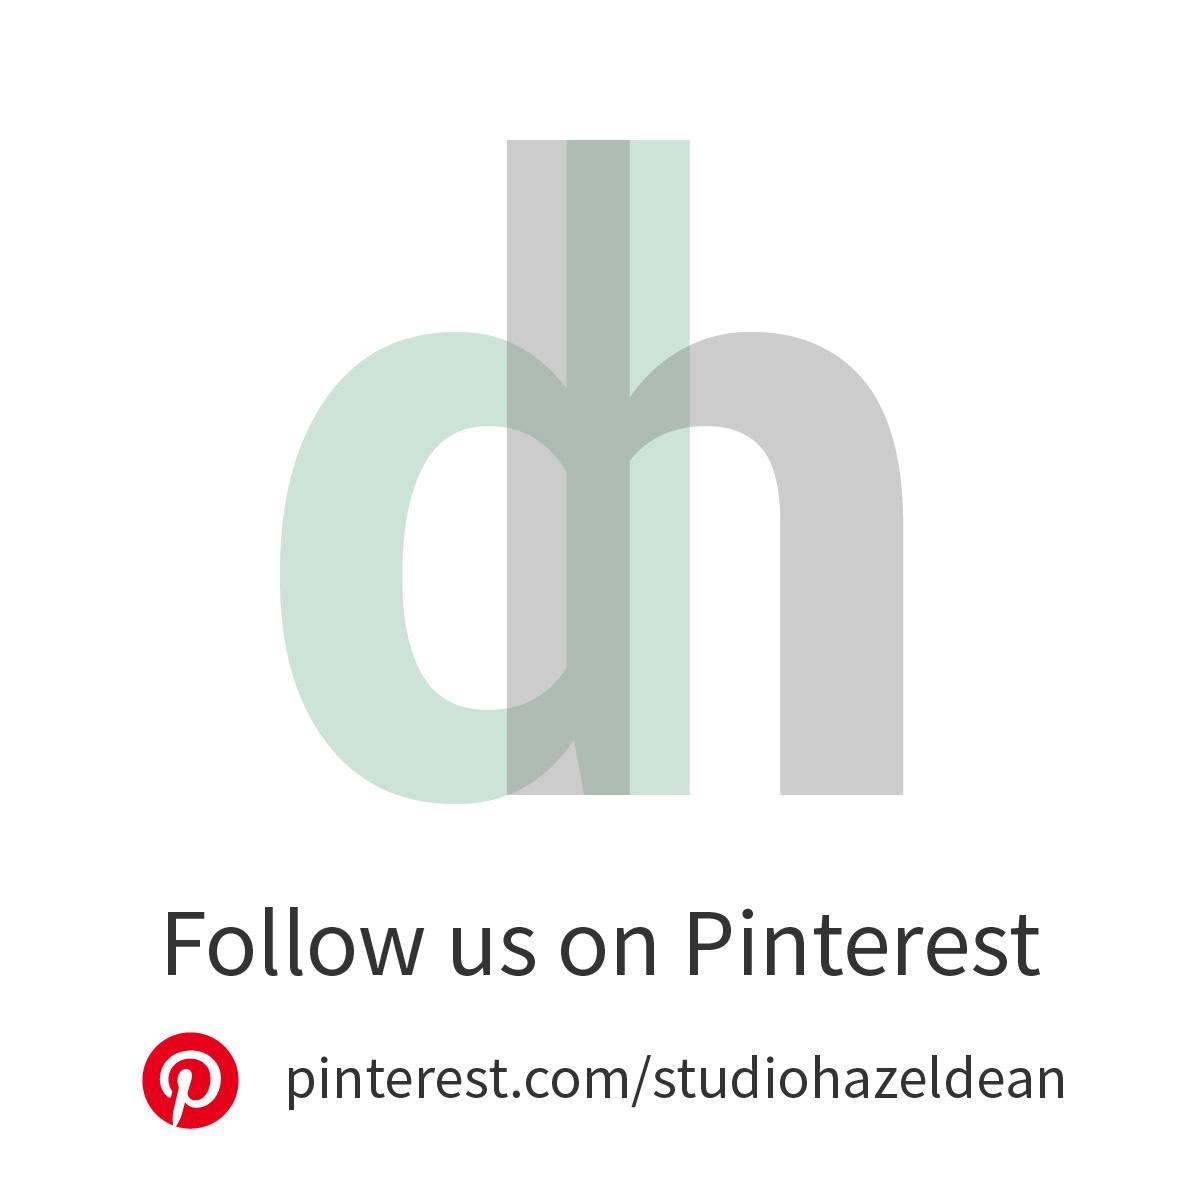 Infographic about following Studio Hazeldean on Pinterest